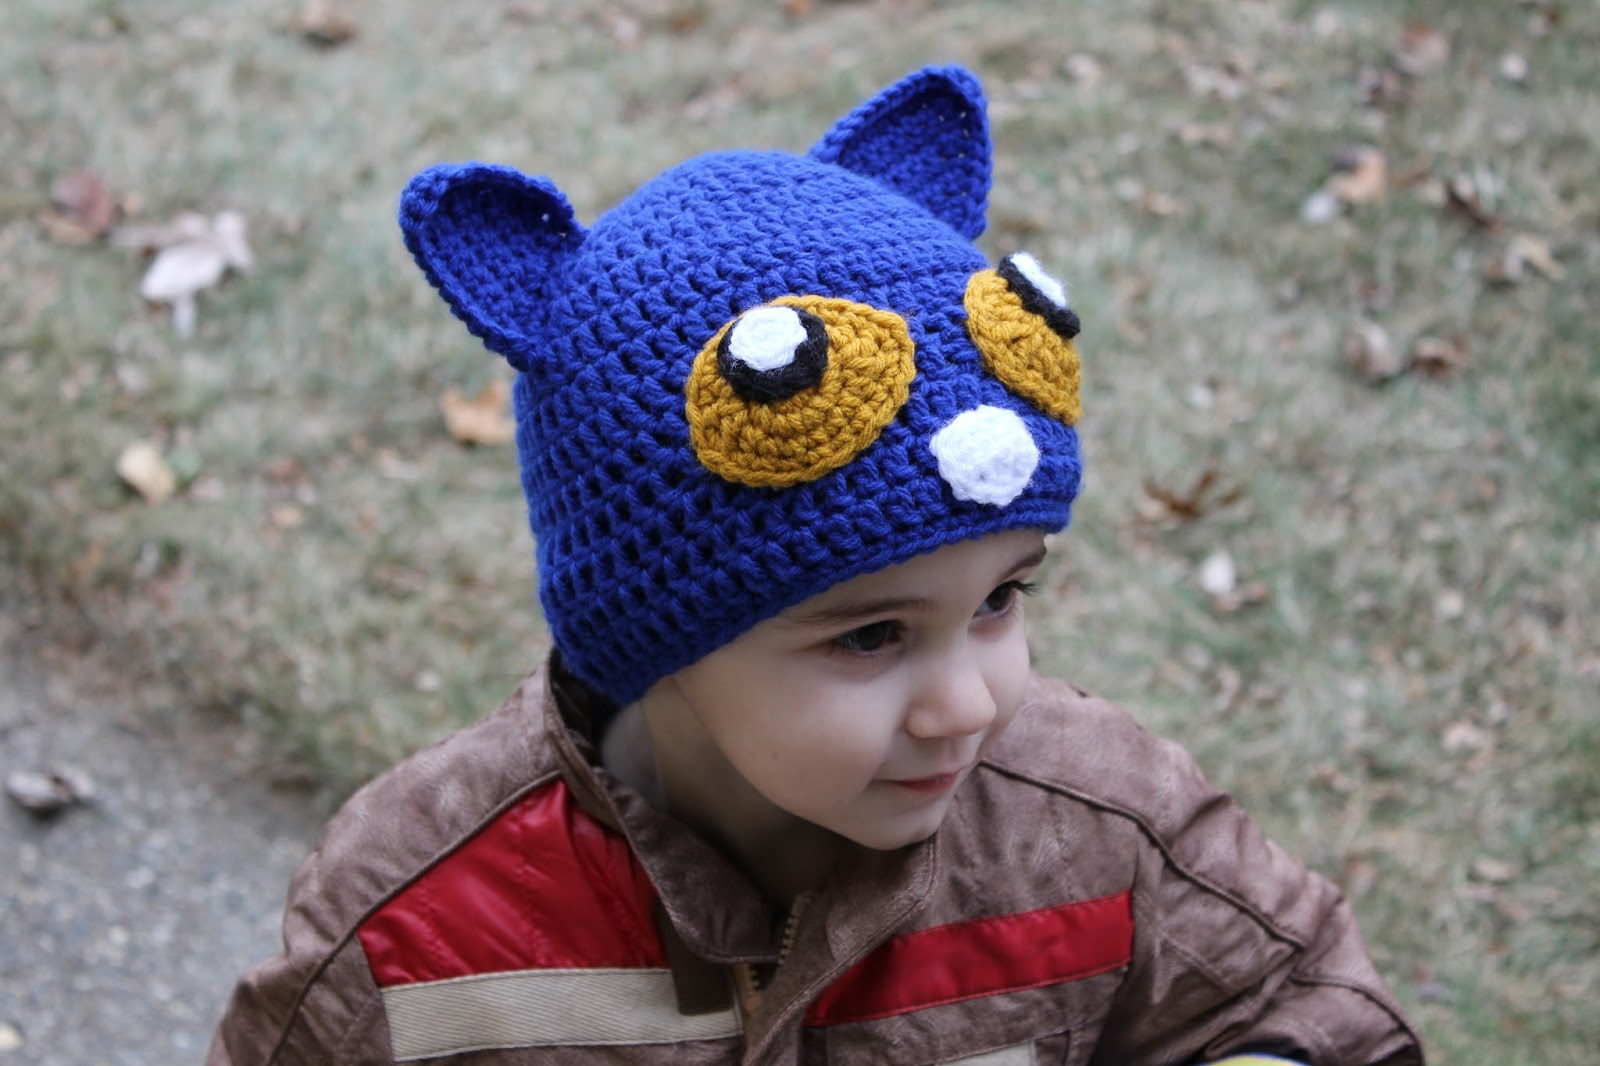 mnopxs2 the blog: Pete the Cat Crochet Hat Pattern